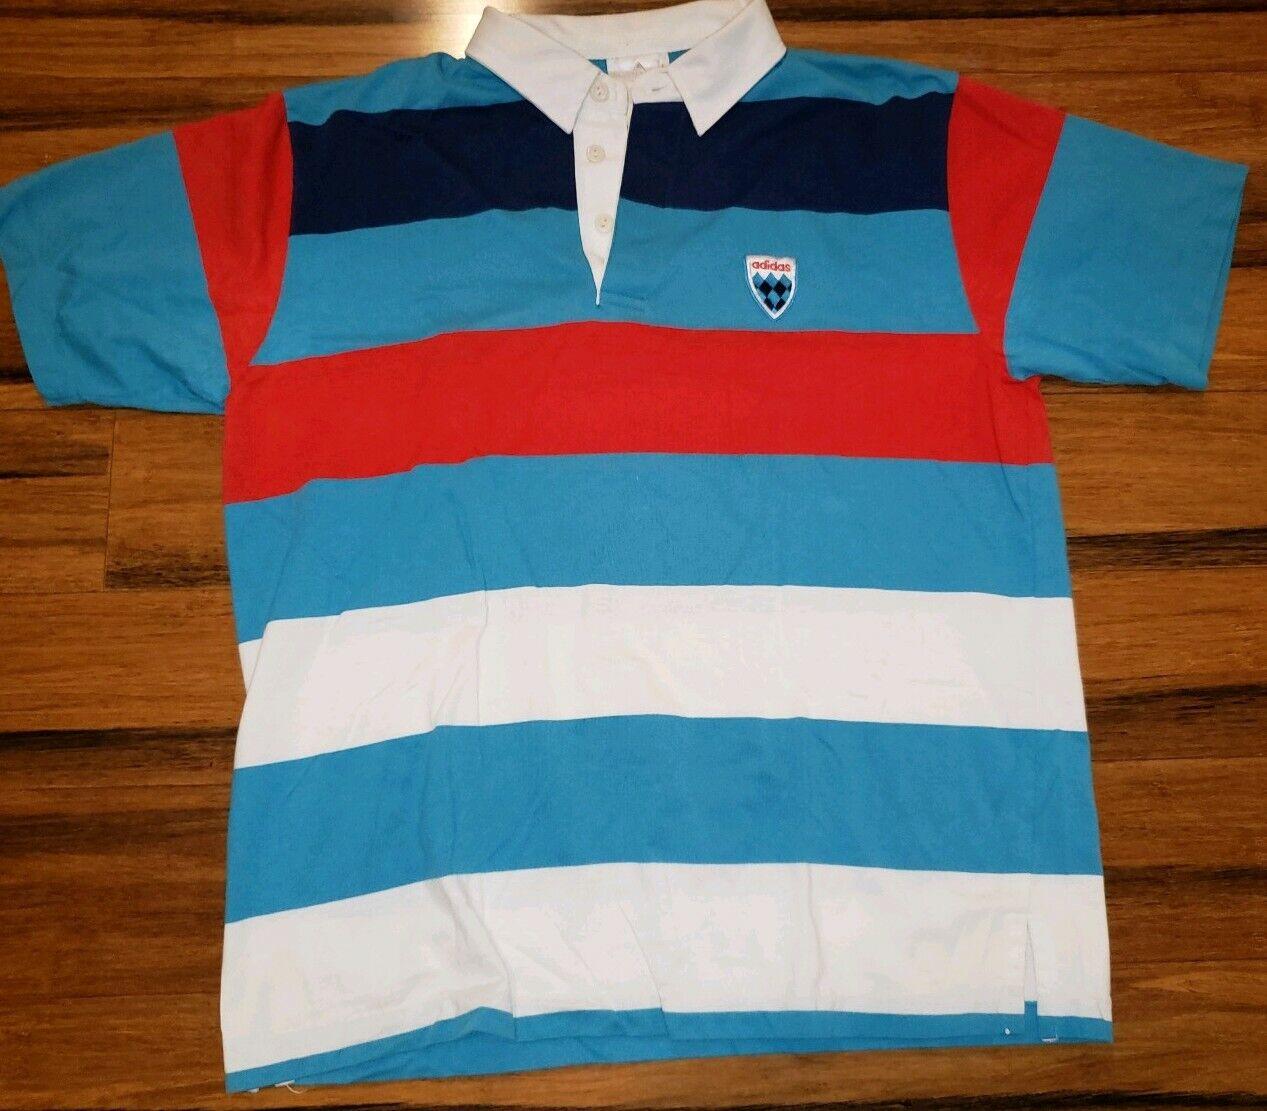 Vtg Adidas 1980s Futbol Soccer Rugby Polo Jersey stripped Blue shirt shield logo